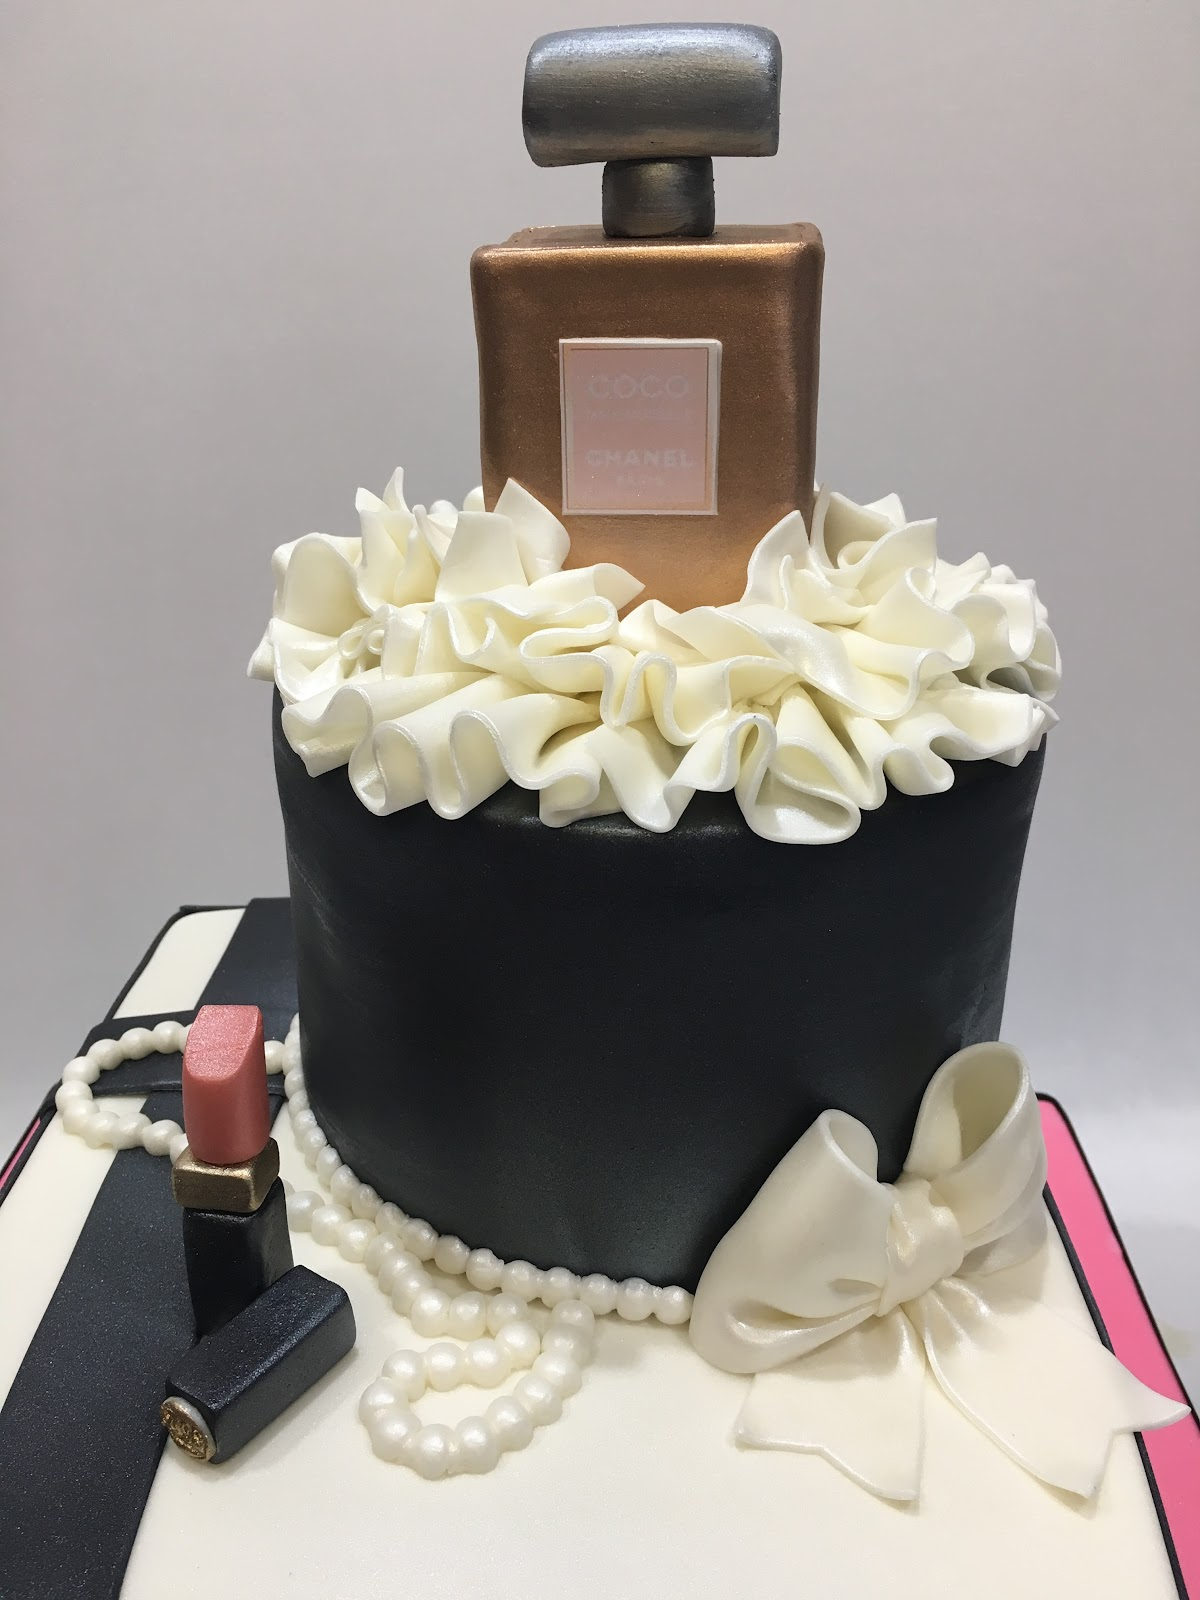 how to make gift box cake